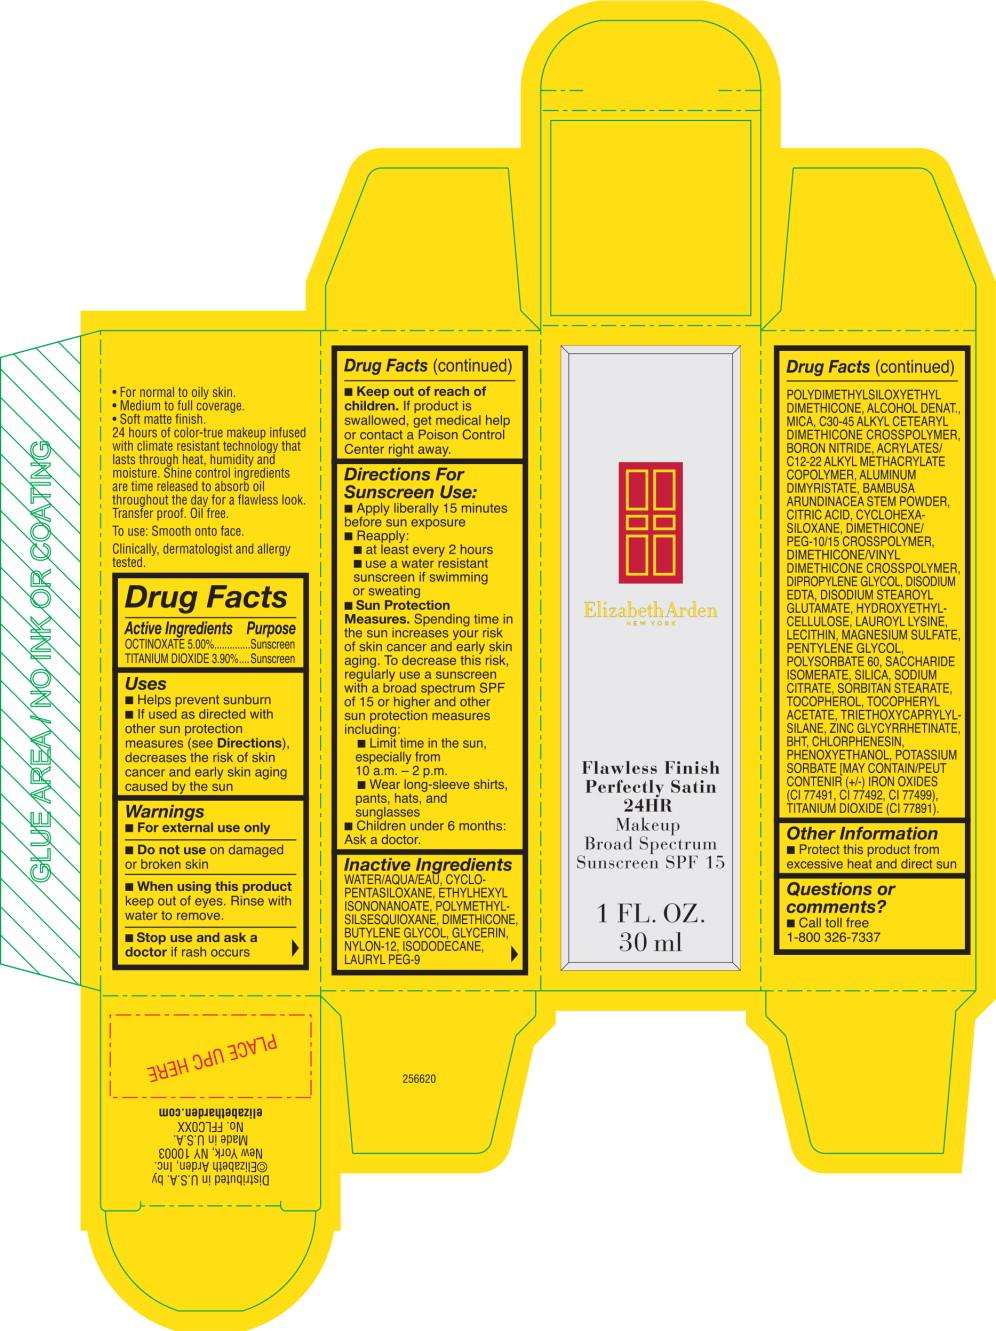 Flawless Finish Perfectly Satinb 24hr Makeup Shade Sand (Octinoxate, Titanium Dioxide) Cream [Elizabeth Arden, Inc]